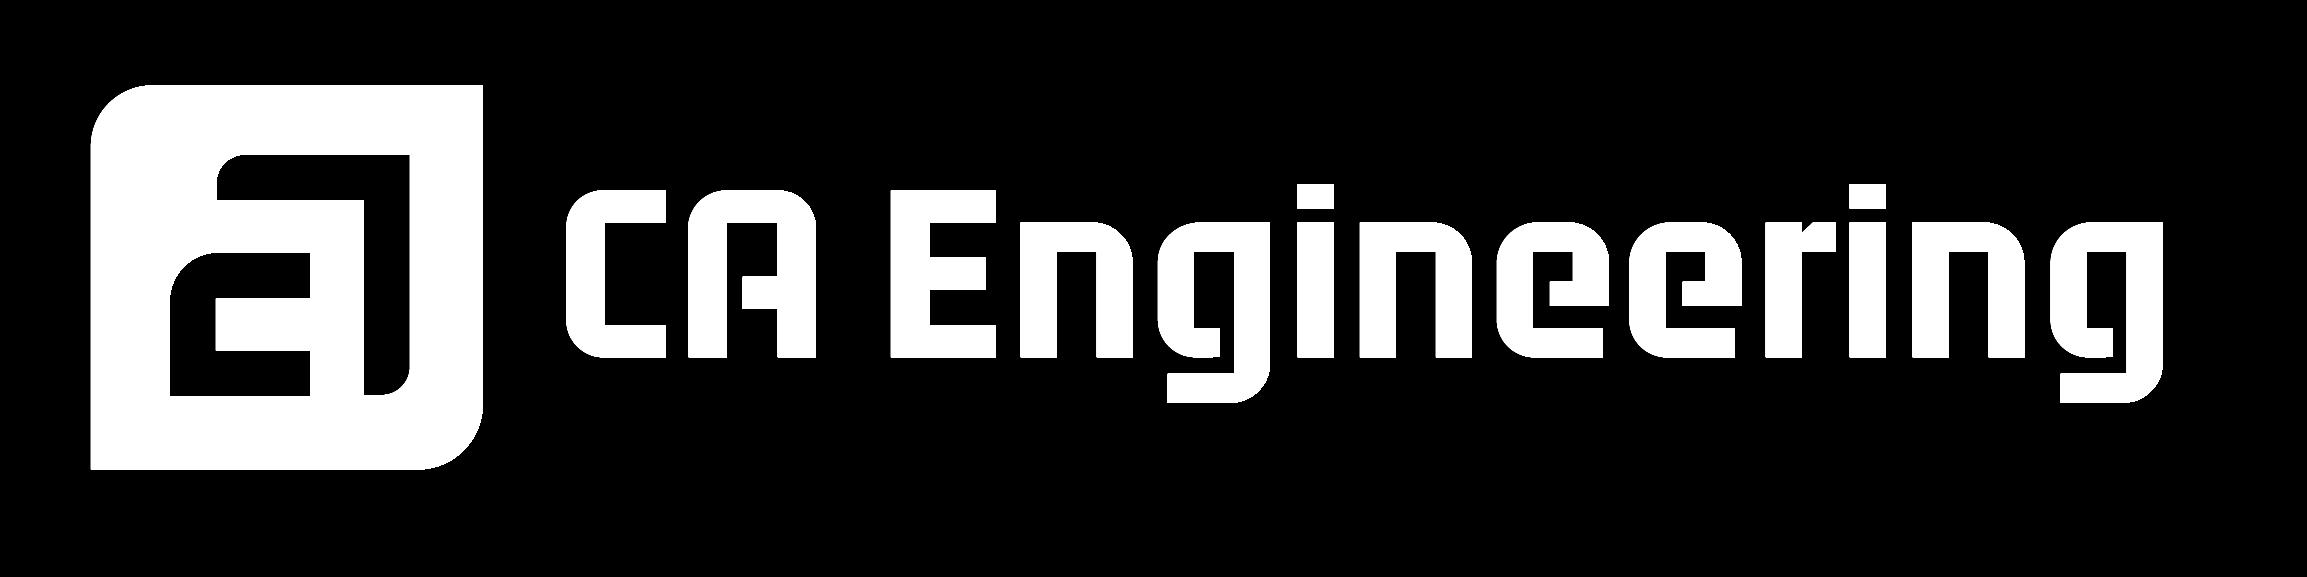 https://secureservercdn.net/198.71.233.38/5hi.6c7.myftpupload.com/wp-content/uploads/2020/04/cropped-CAE_horizontal_wht.png